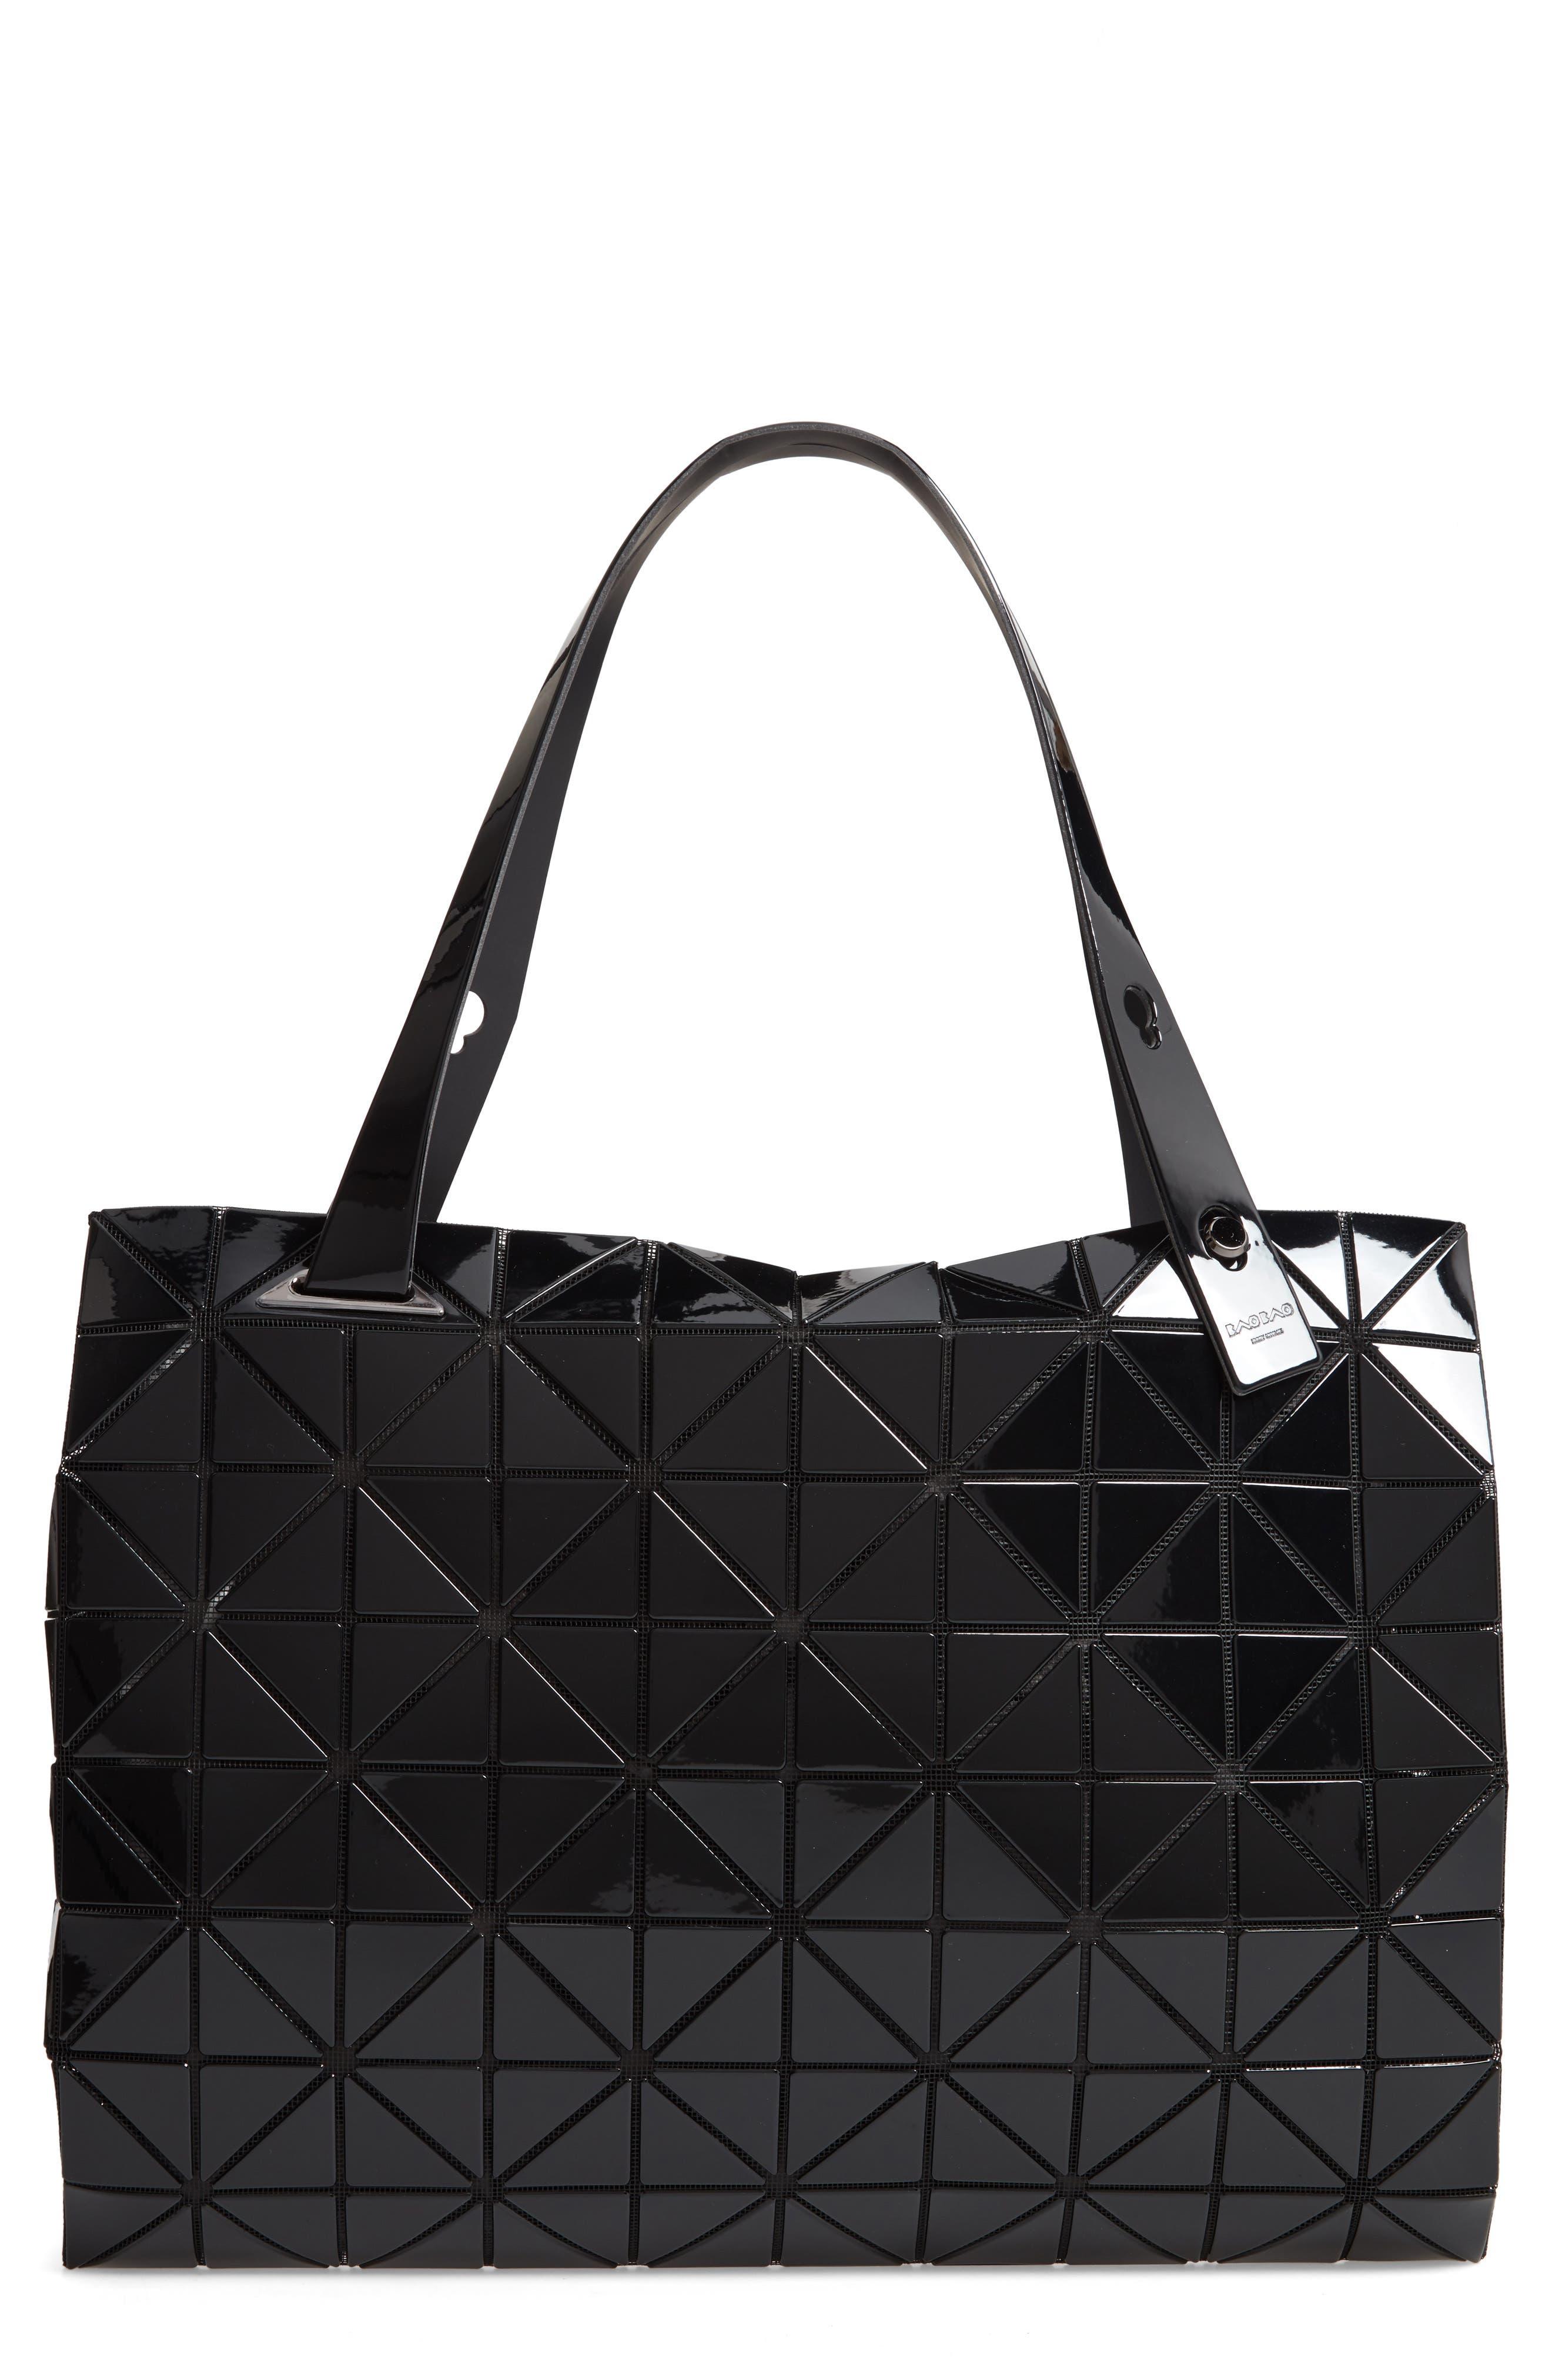 Carton Prism Tote Bag,                         Main,                         color, BLACK